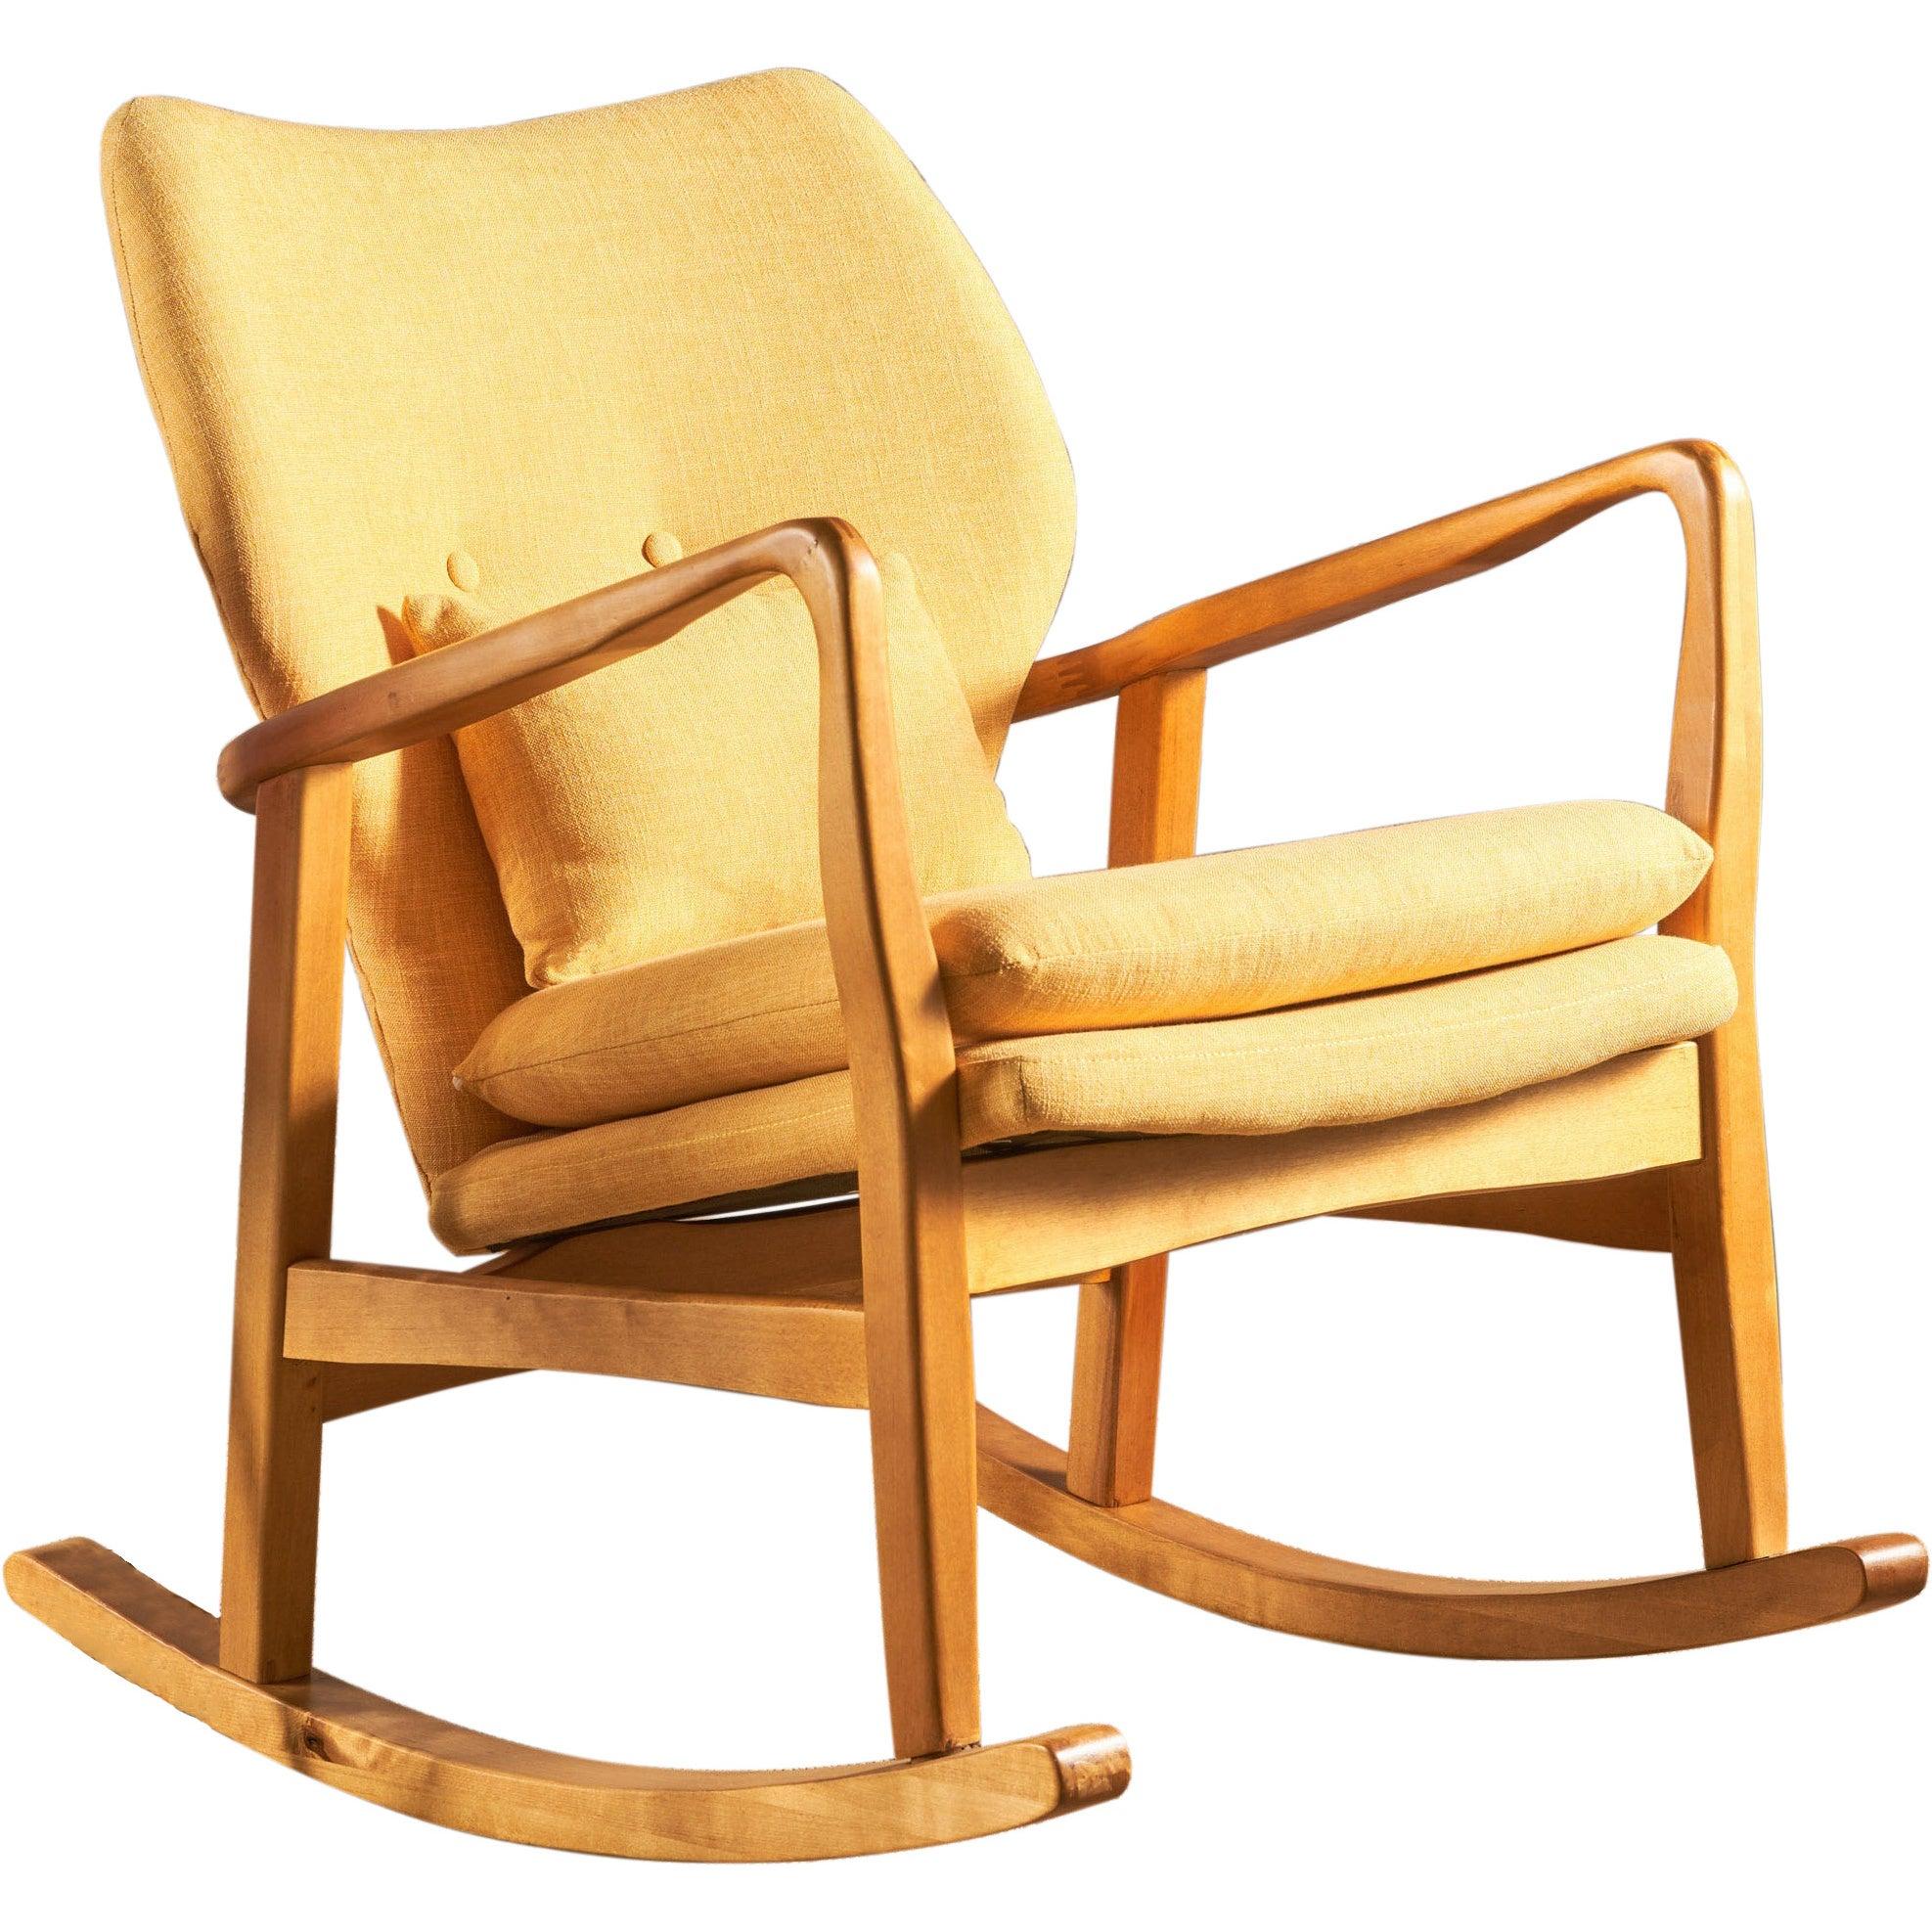 Benny Mid Century Modern Fabric Rocking Chairchristopher Knight Home Regarding Mid Century Modern Fabric Rocking Chairs (View 9 of 20)